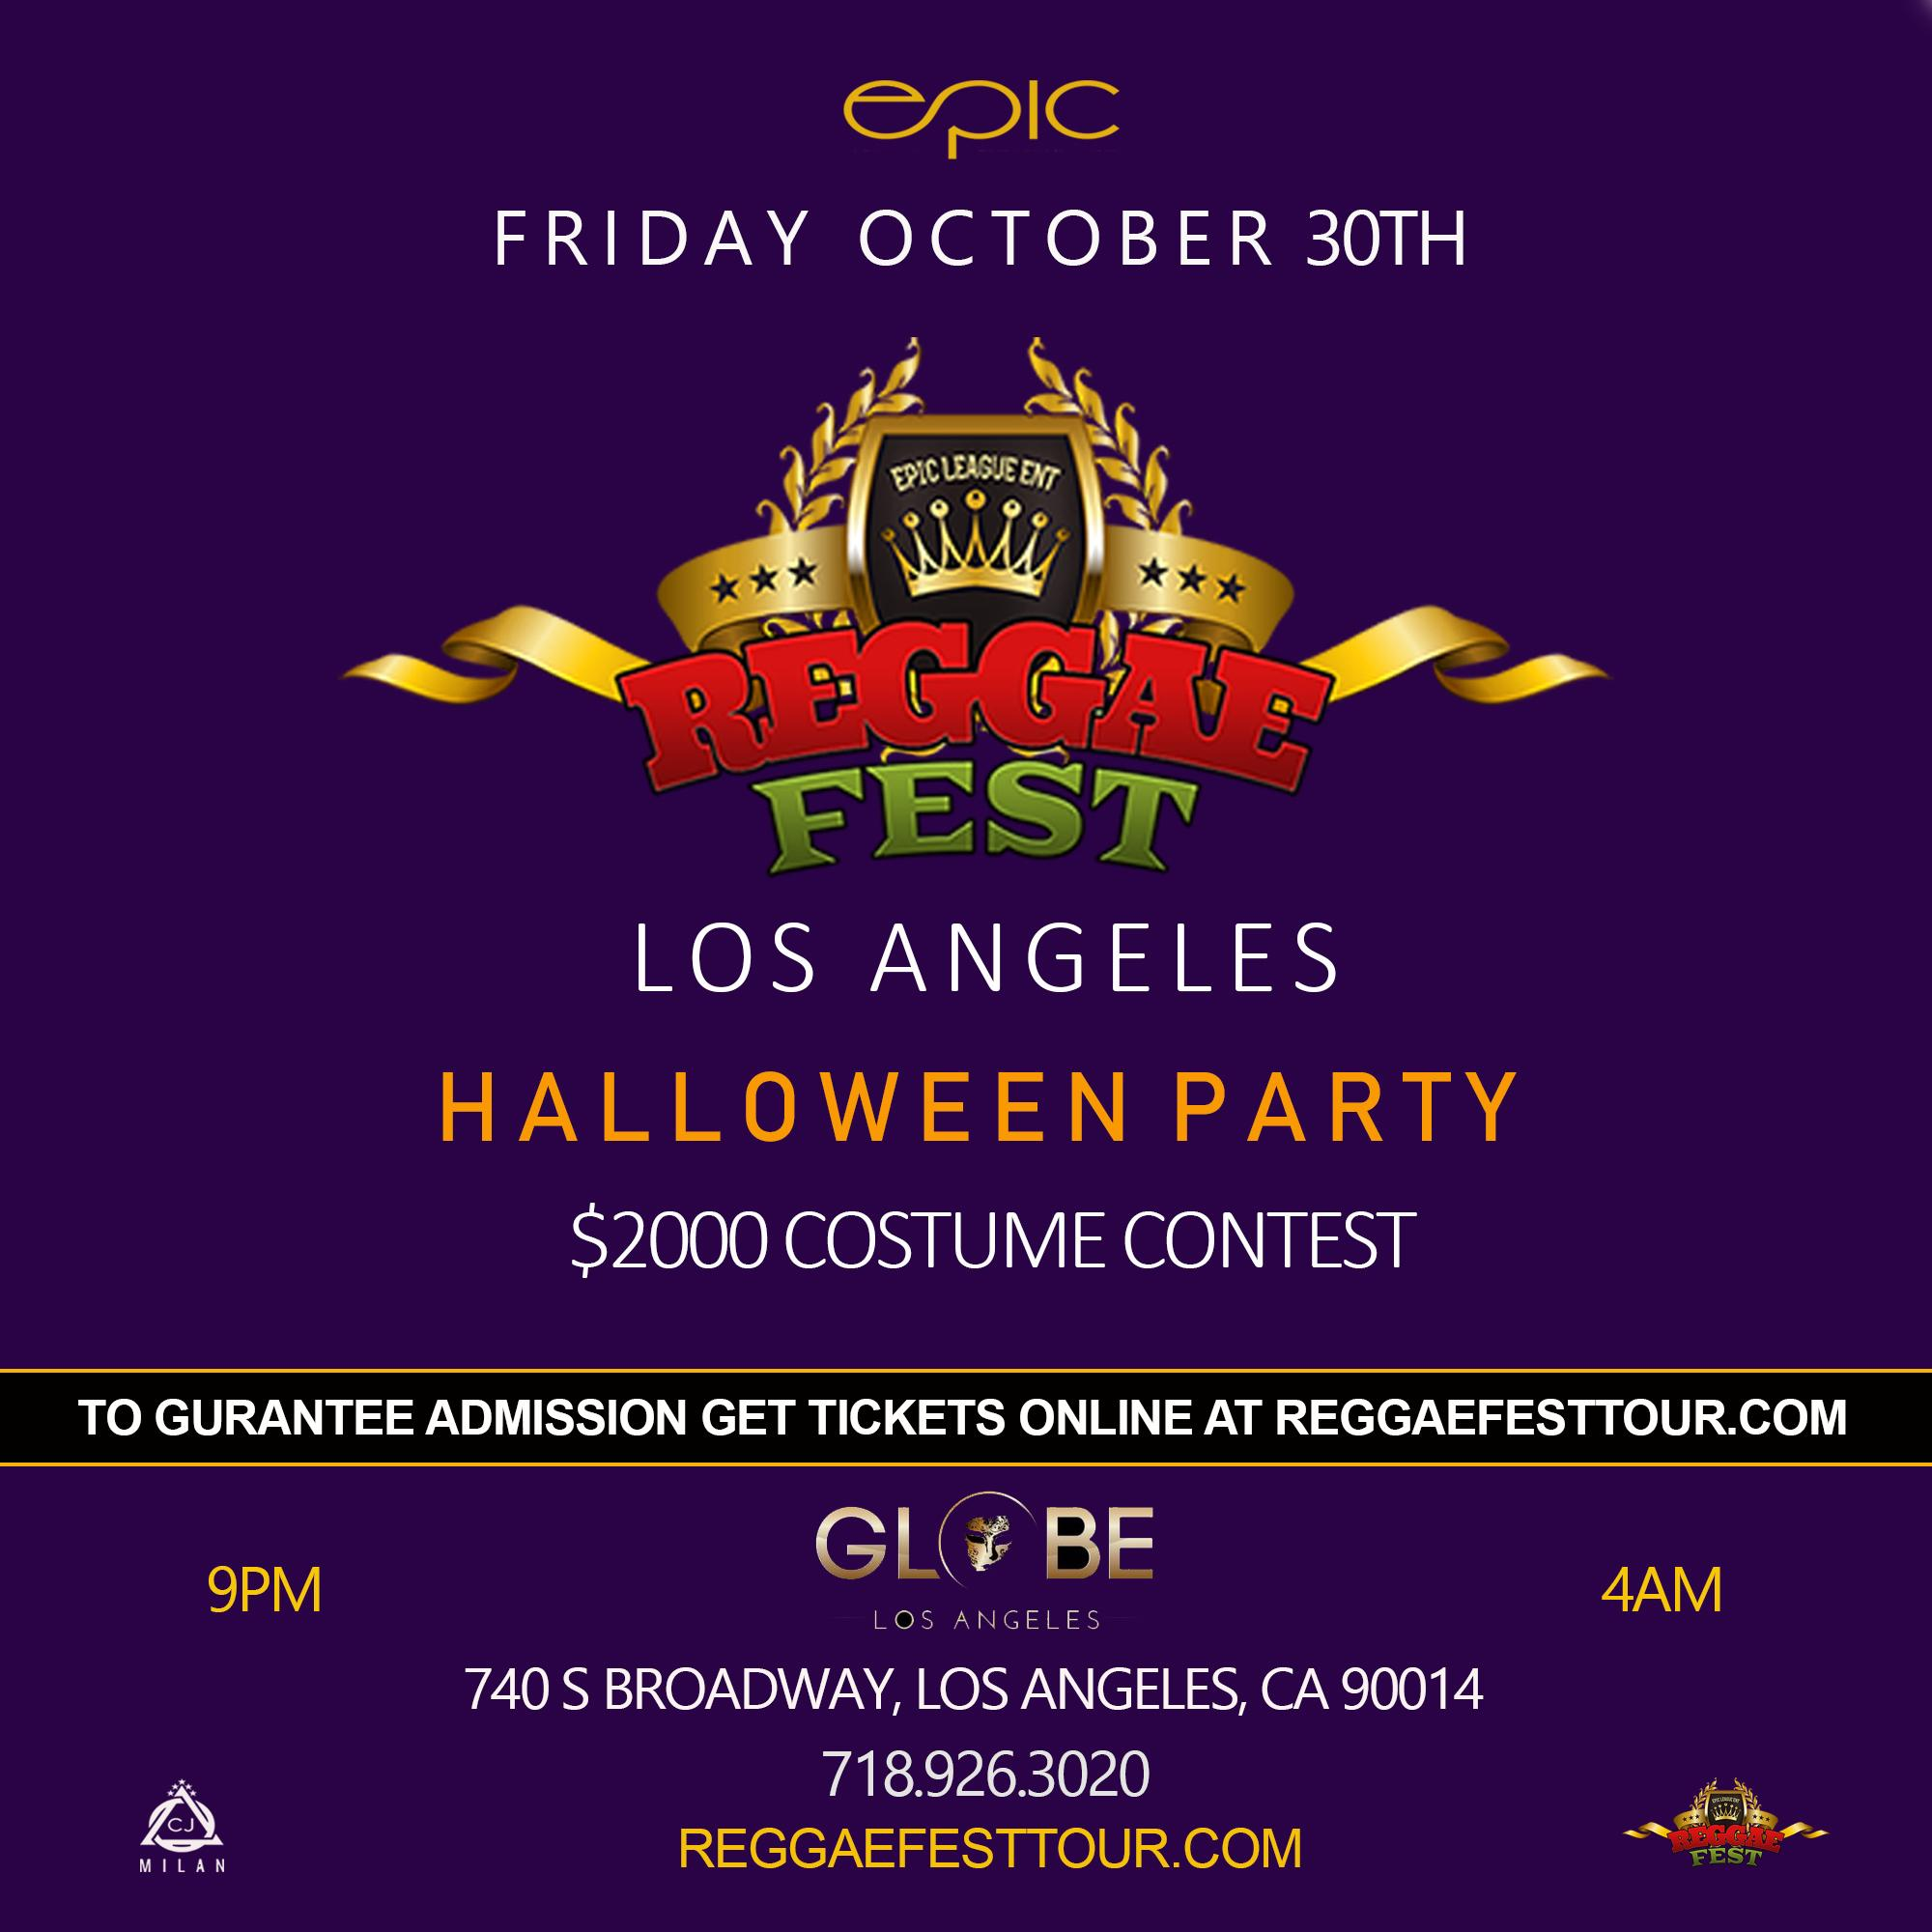 Los Angeles Halloween Party 2020 Reggae Fest LA Halloween Party $2000 Costume Contest at Globe